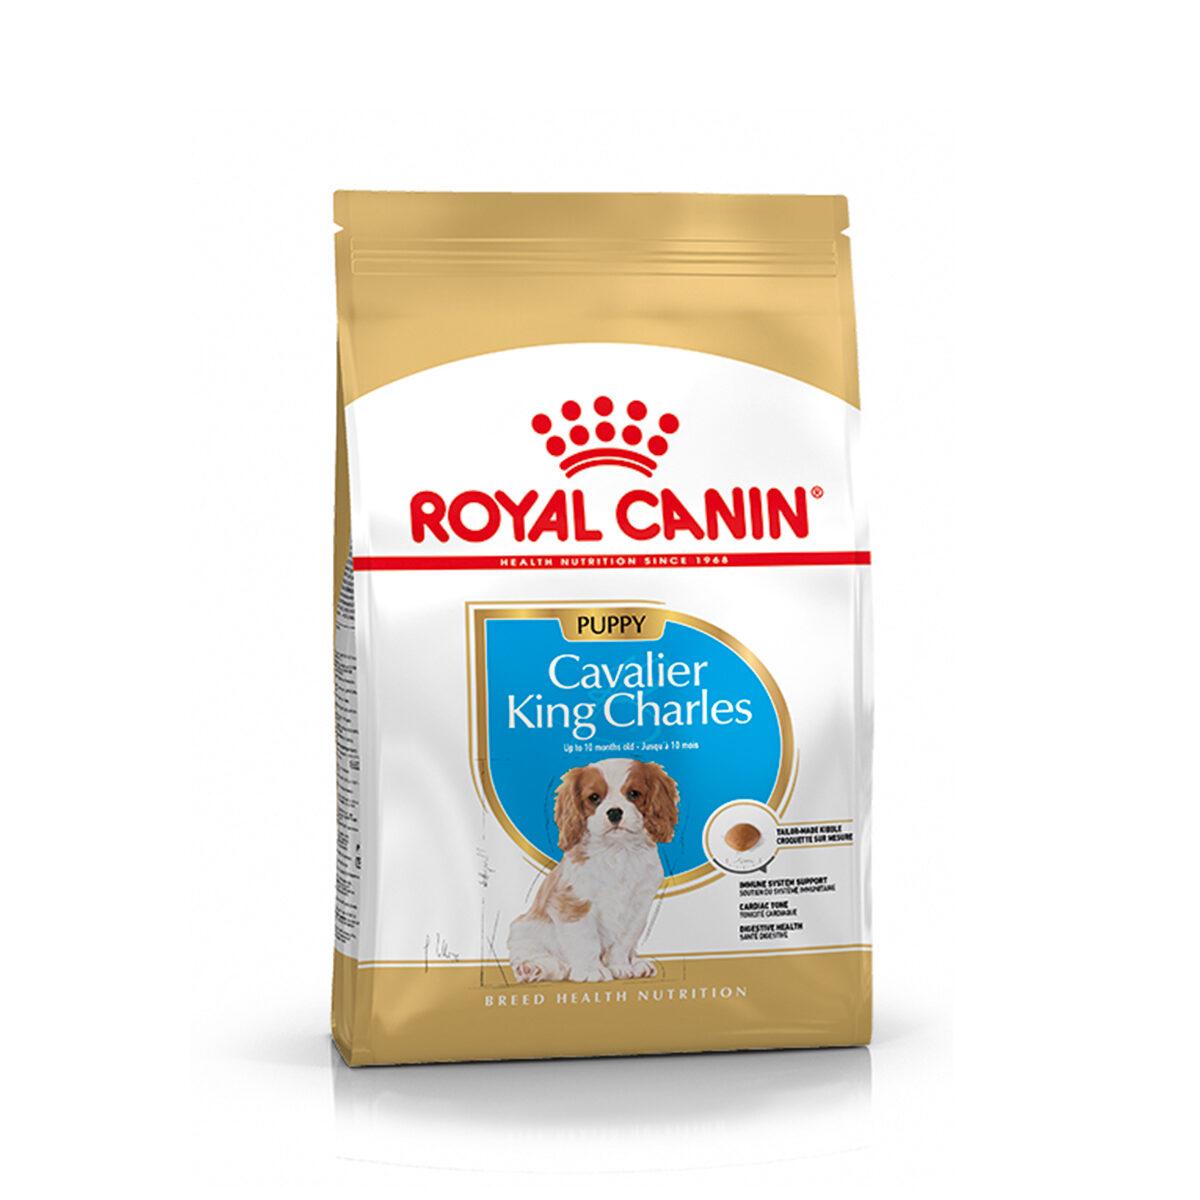 Royal Canin Cavalier King Charles Puppy Hondenvoer 1,5 kg